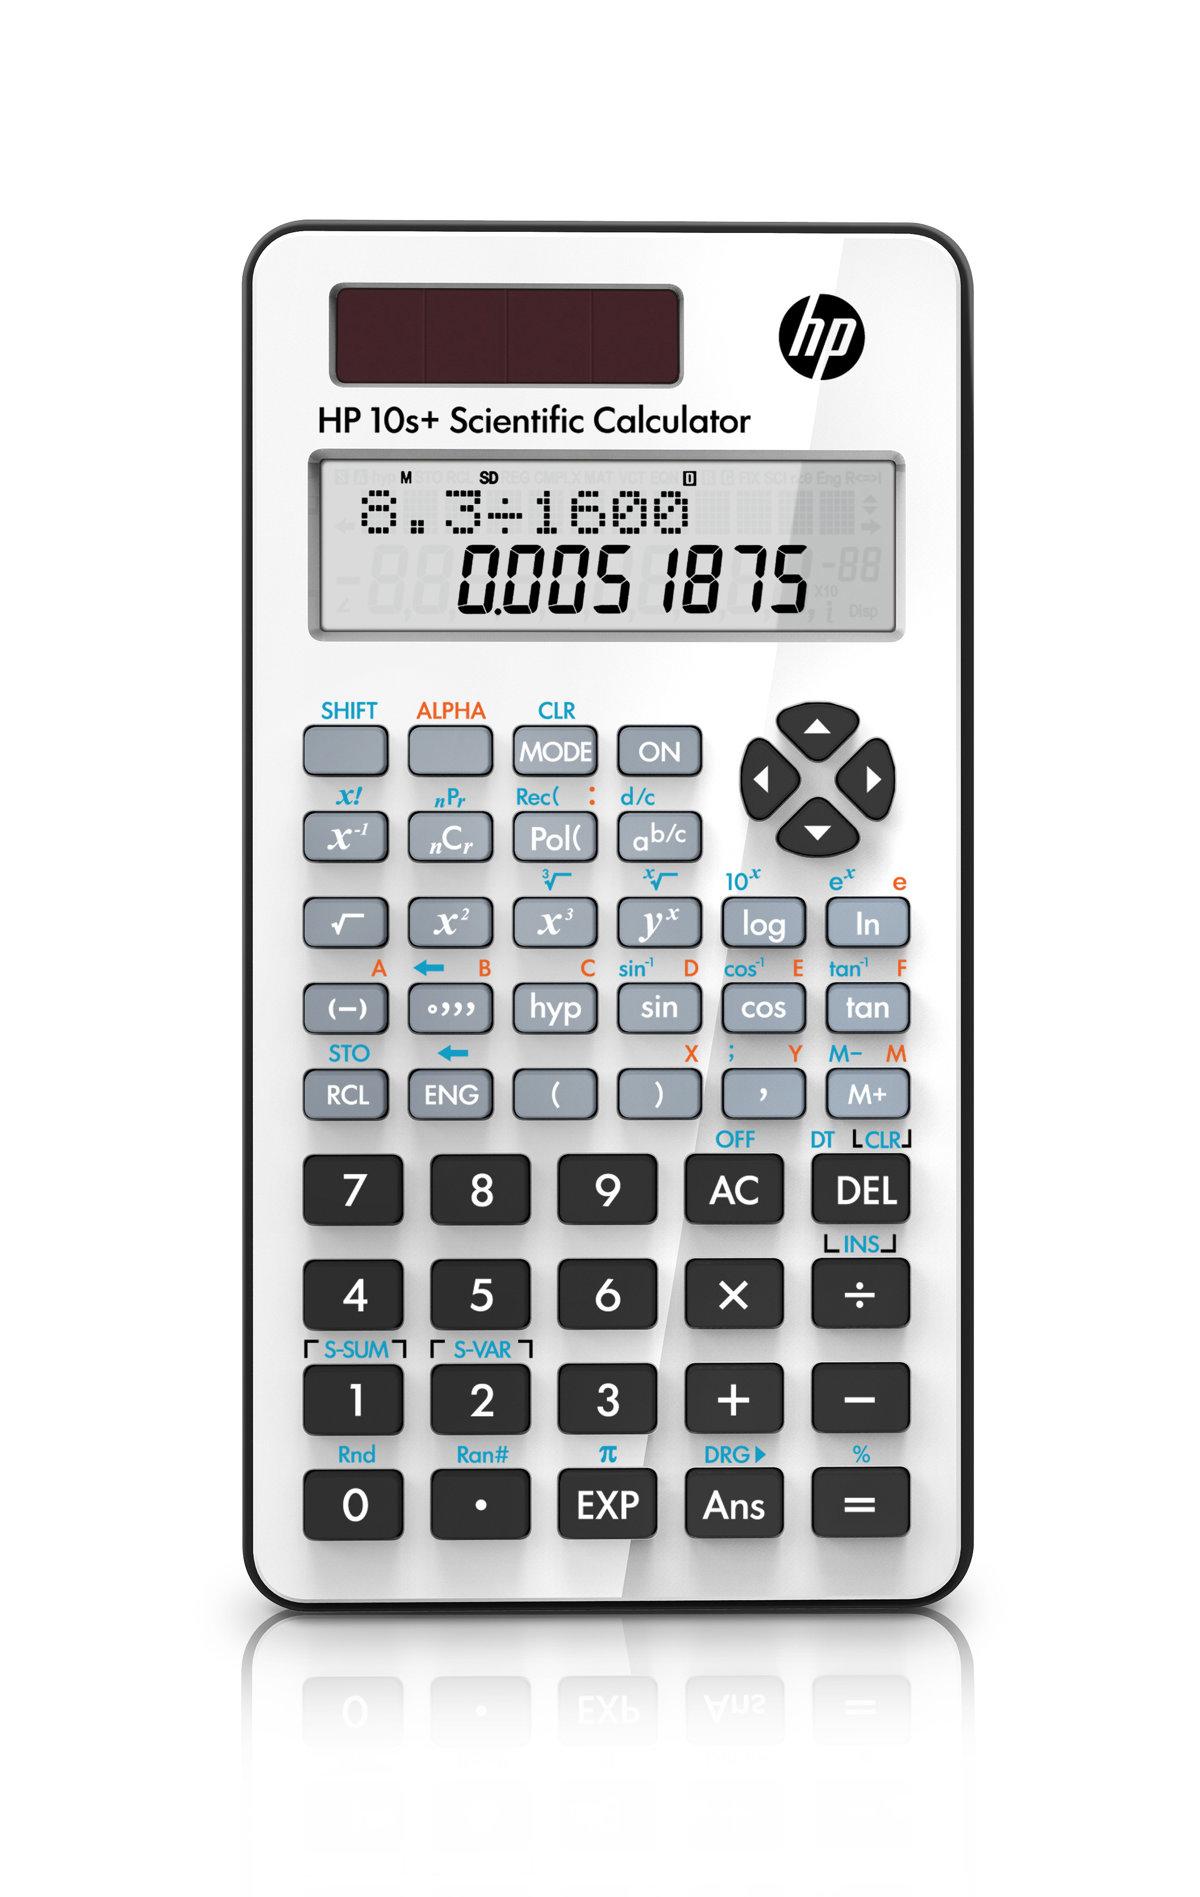 Product Hp 10s Scientific Calculator Kalkulator Casio Portable Printer Hr 8 Tm Slide 1 Of 2show Larger Image